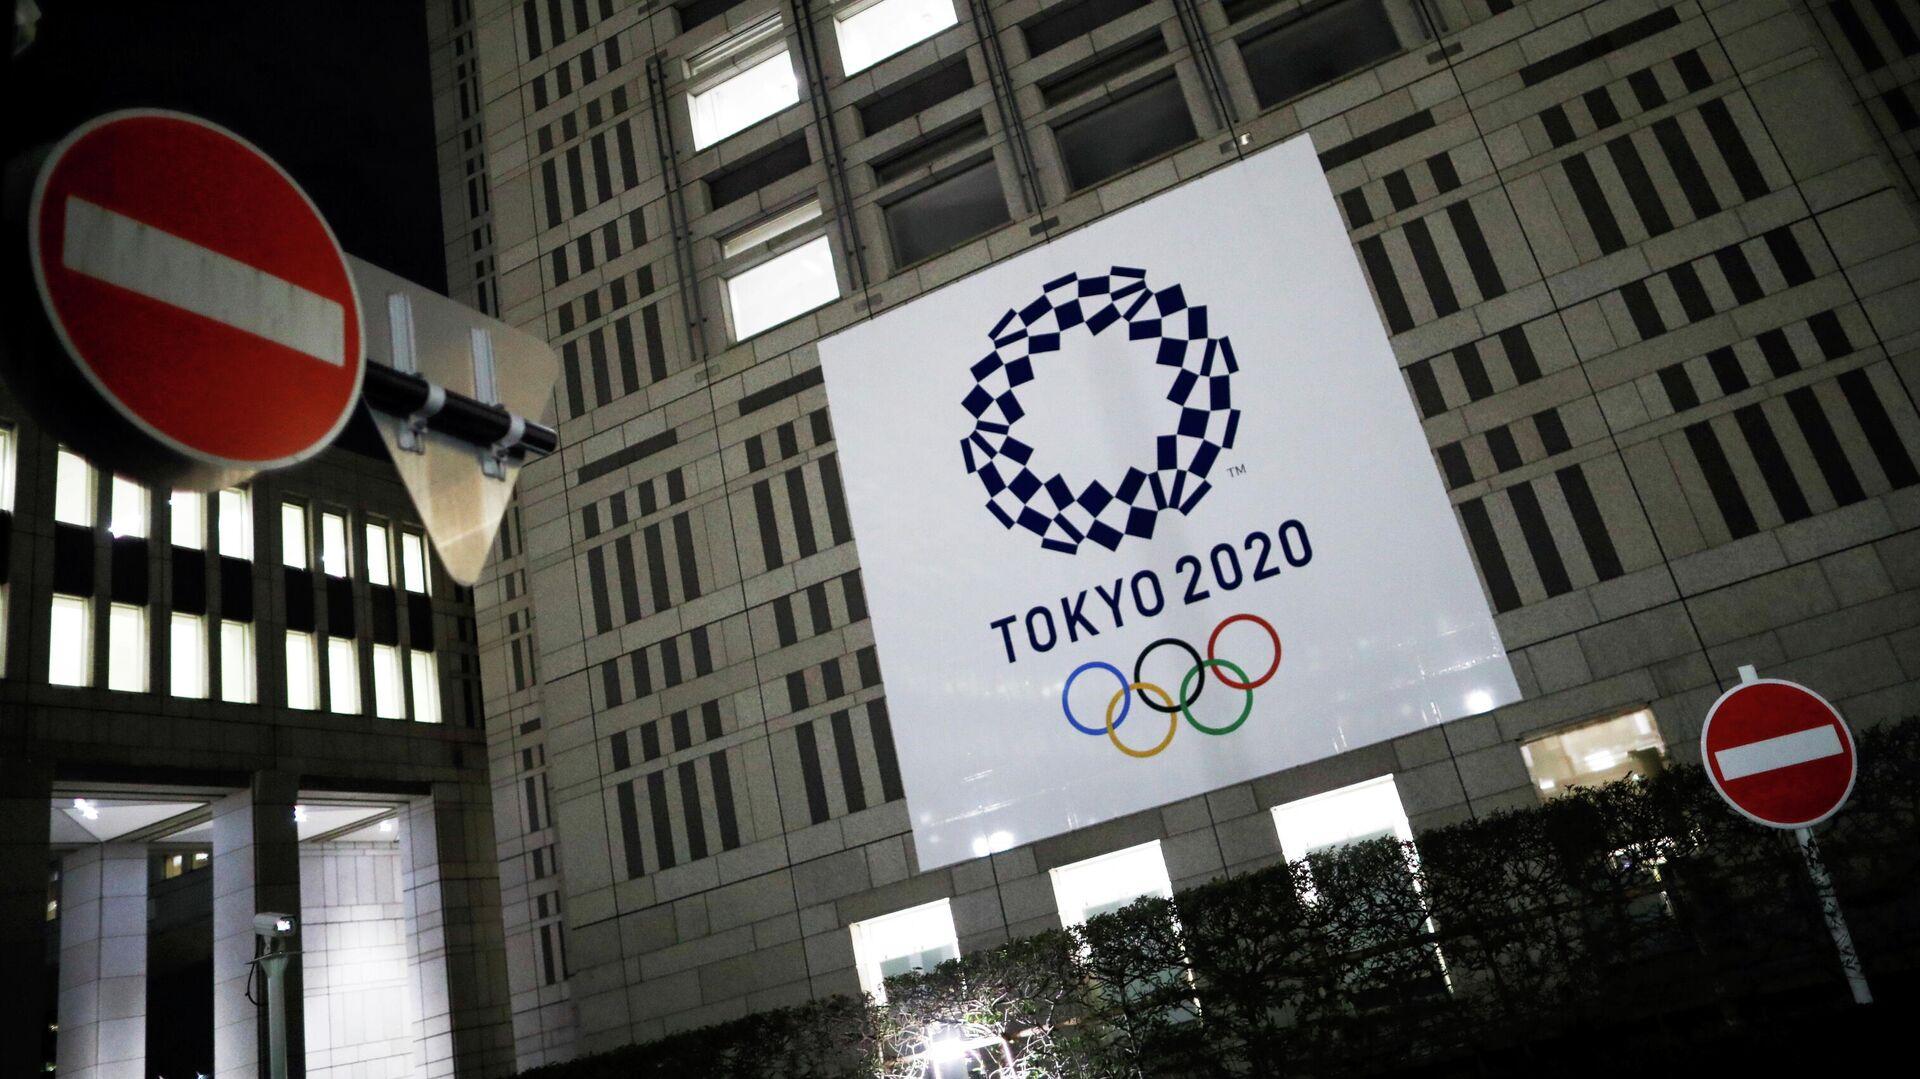 Логотип Олимпийских игр в Токио - РИА Новости, 1920, 26.01.2021